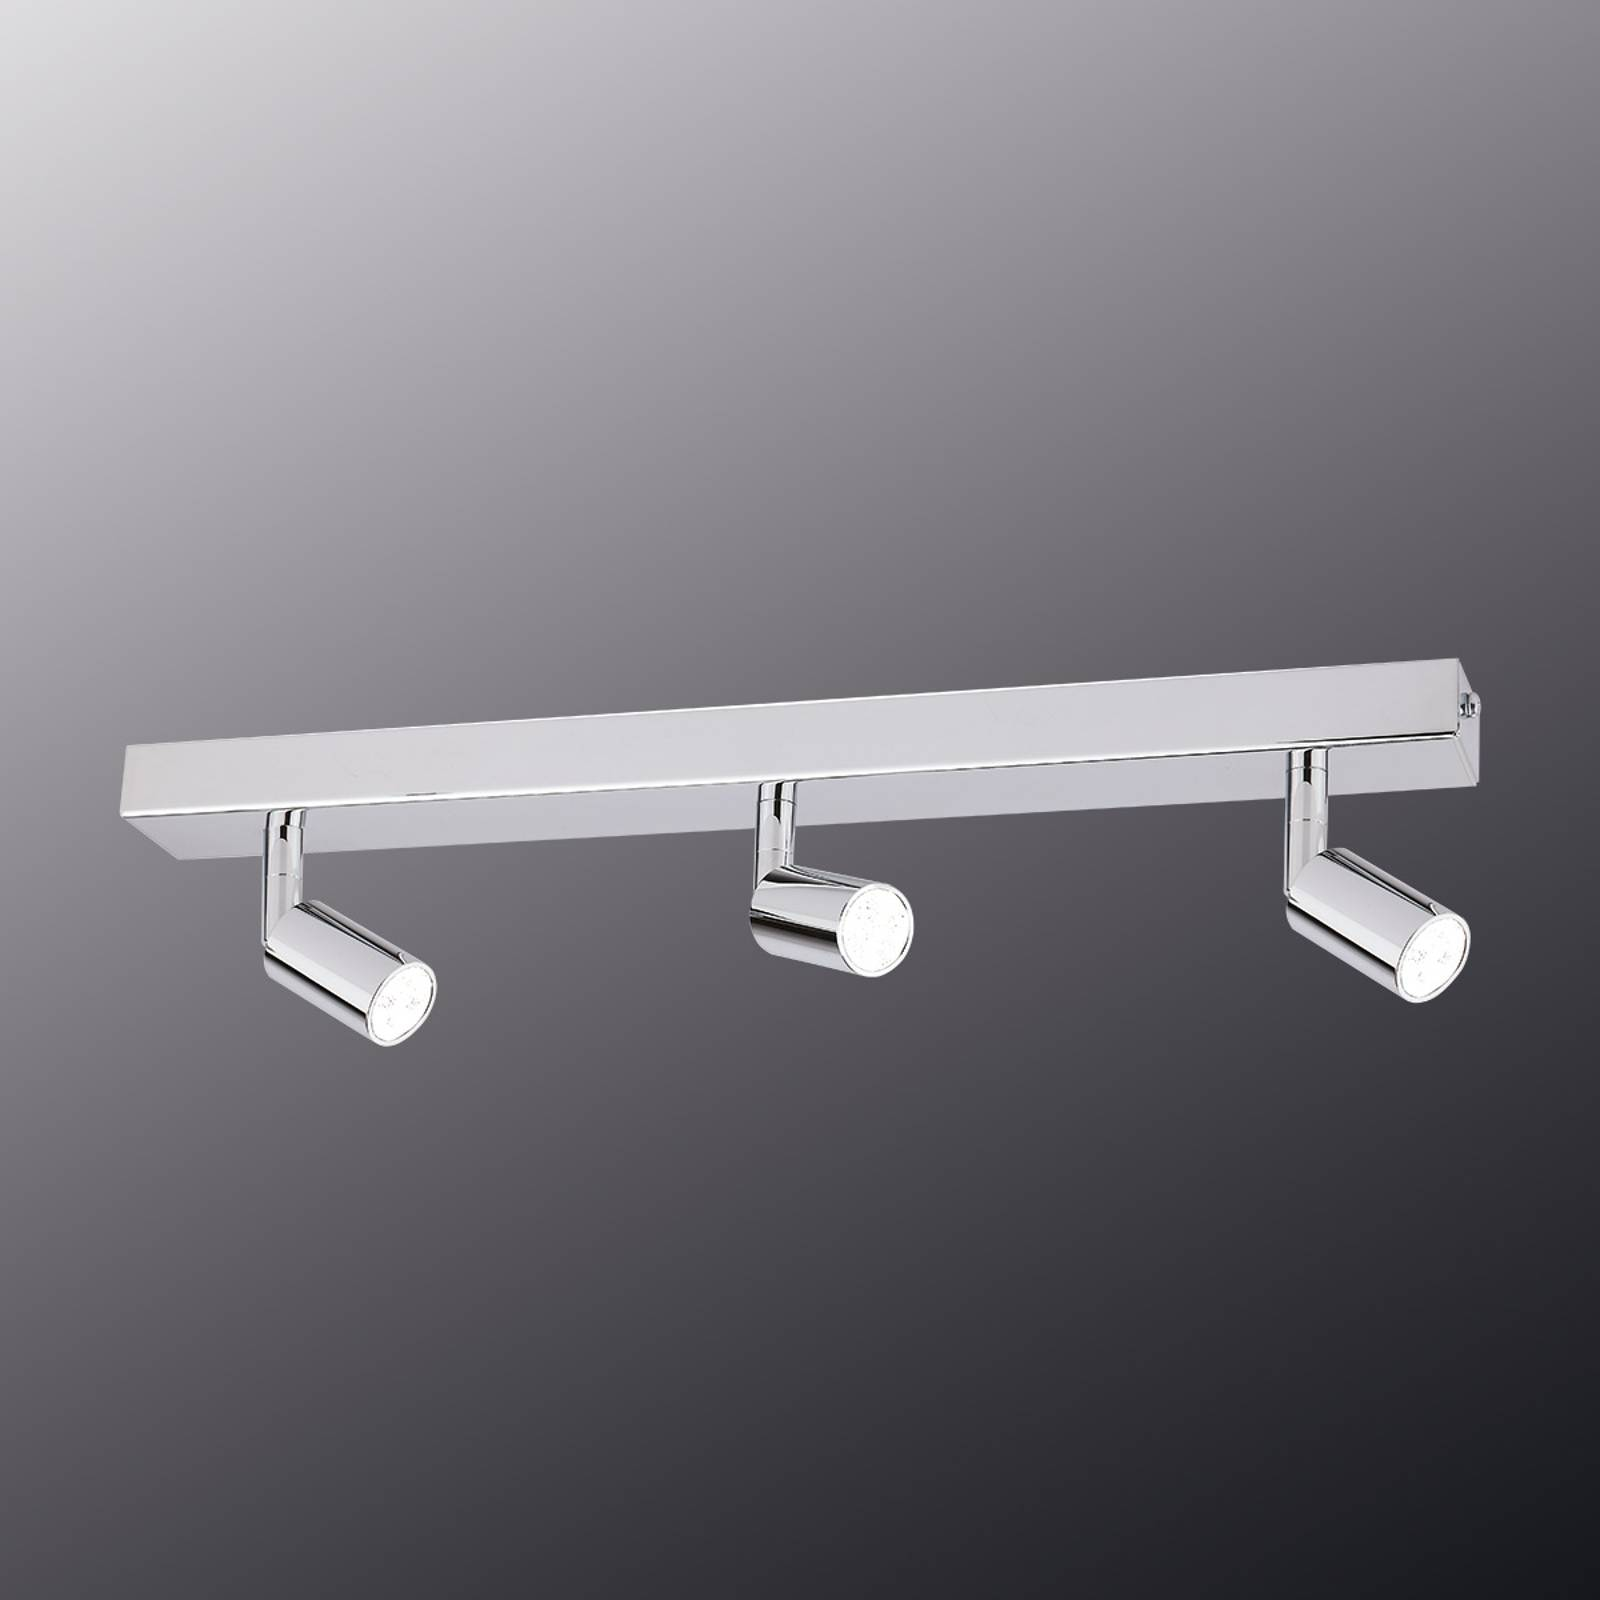 Moderni LED-kattovalaisin, 3-lamppuinen